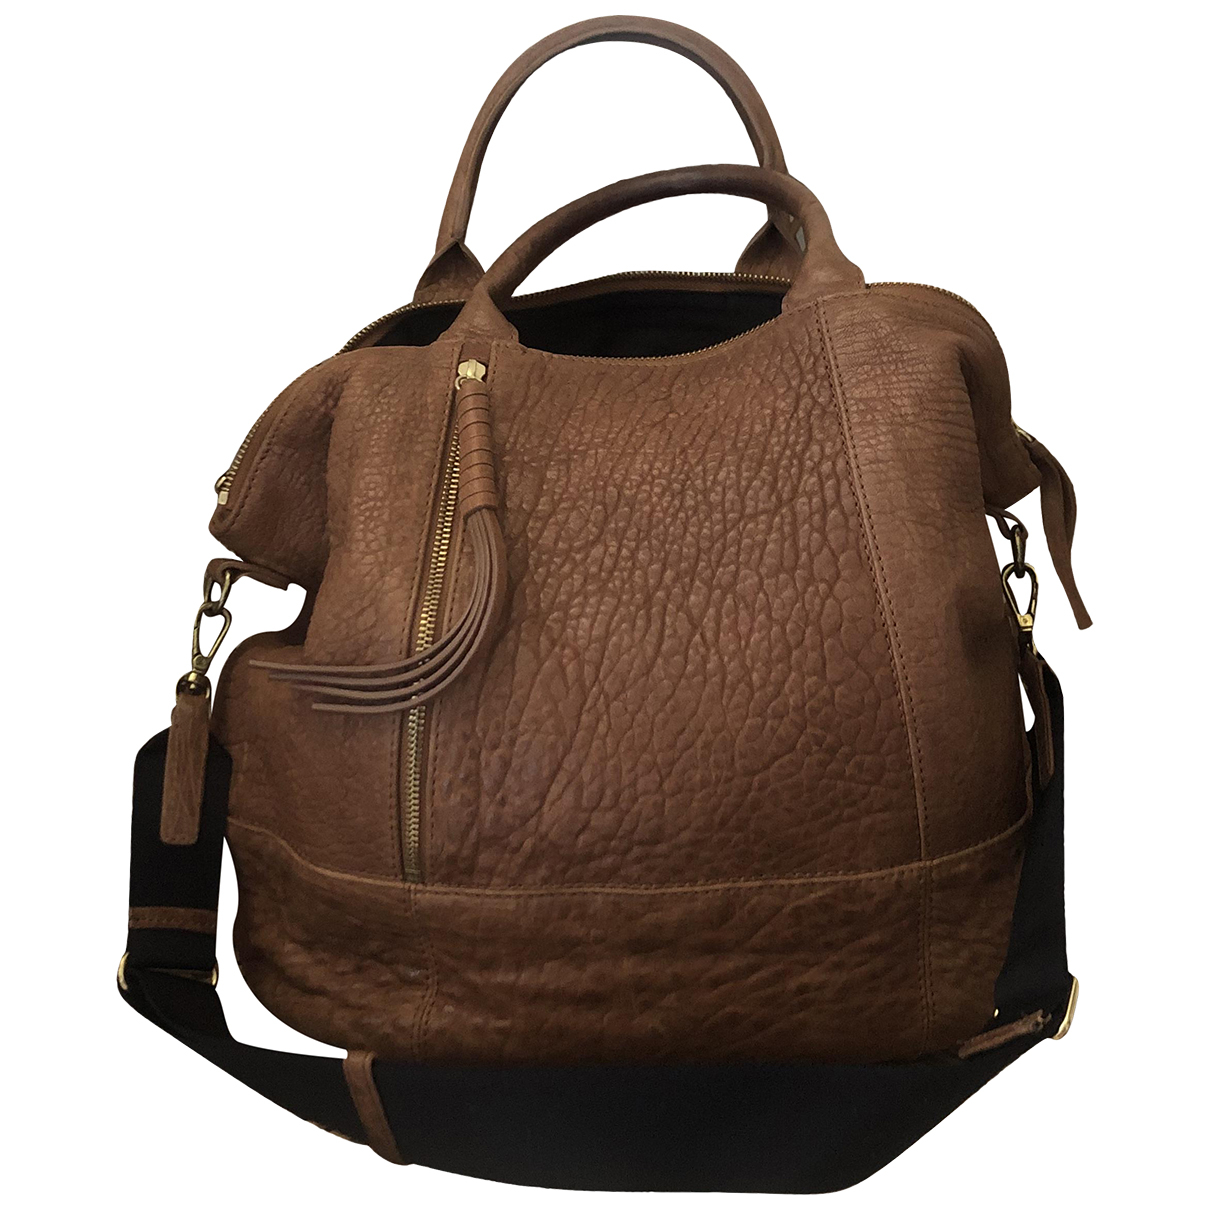 Gerard Darel N Camel Leather handbag for Women N